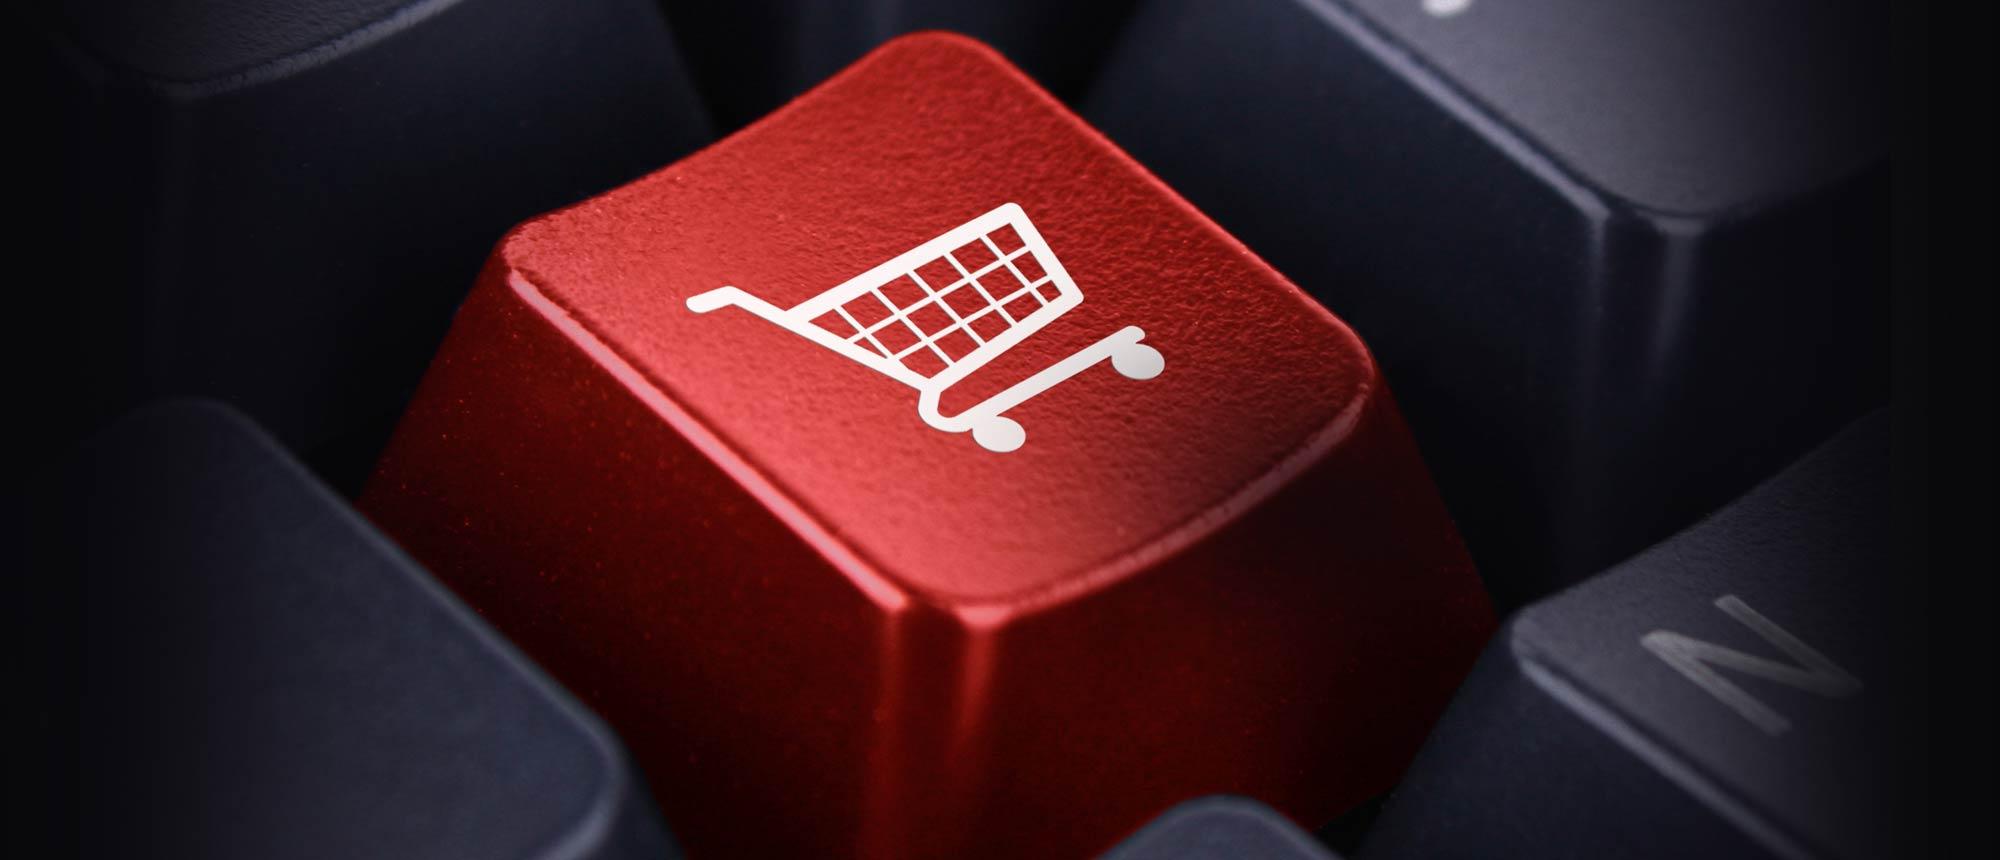 Porquê comprar online